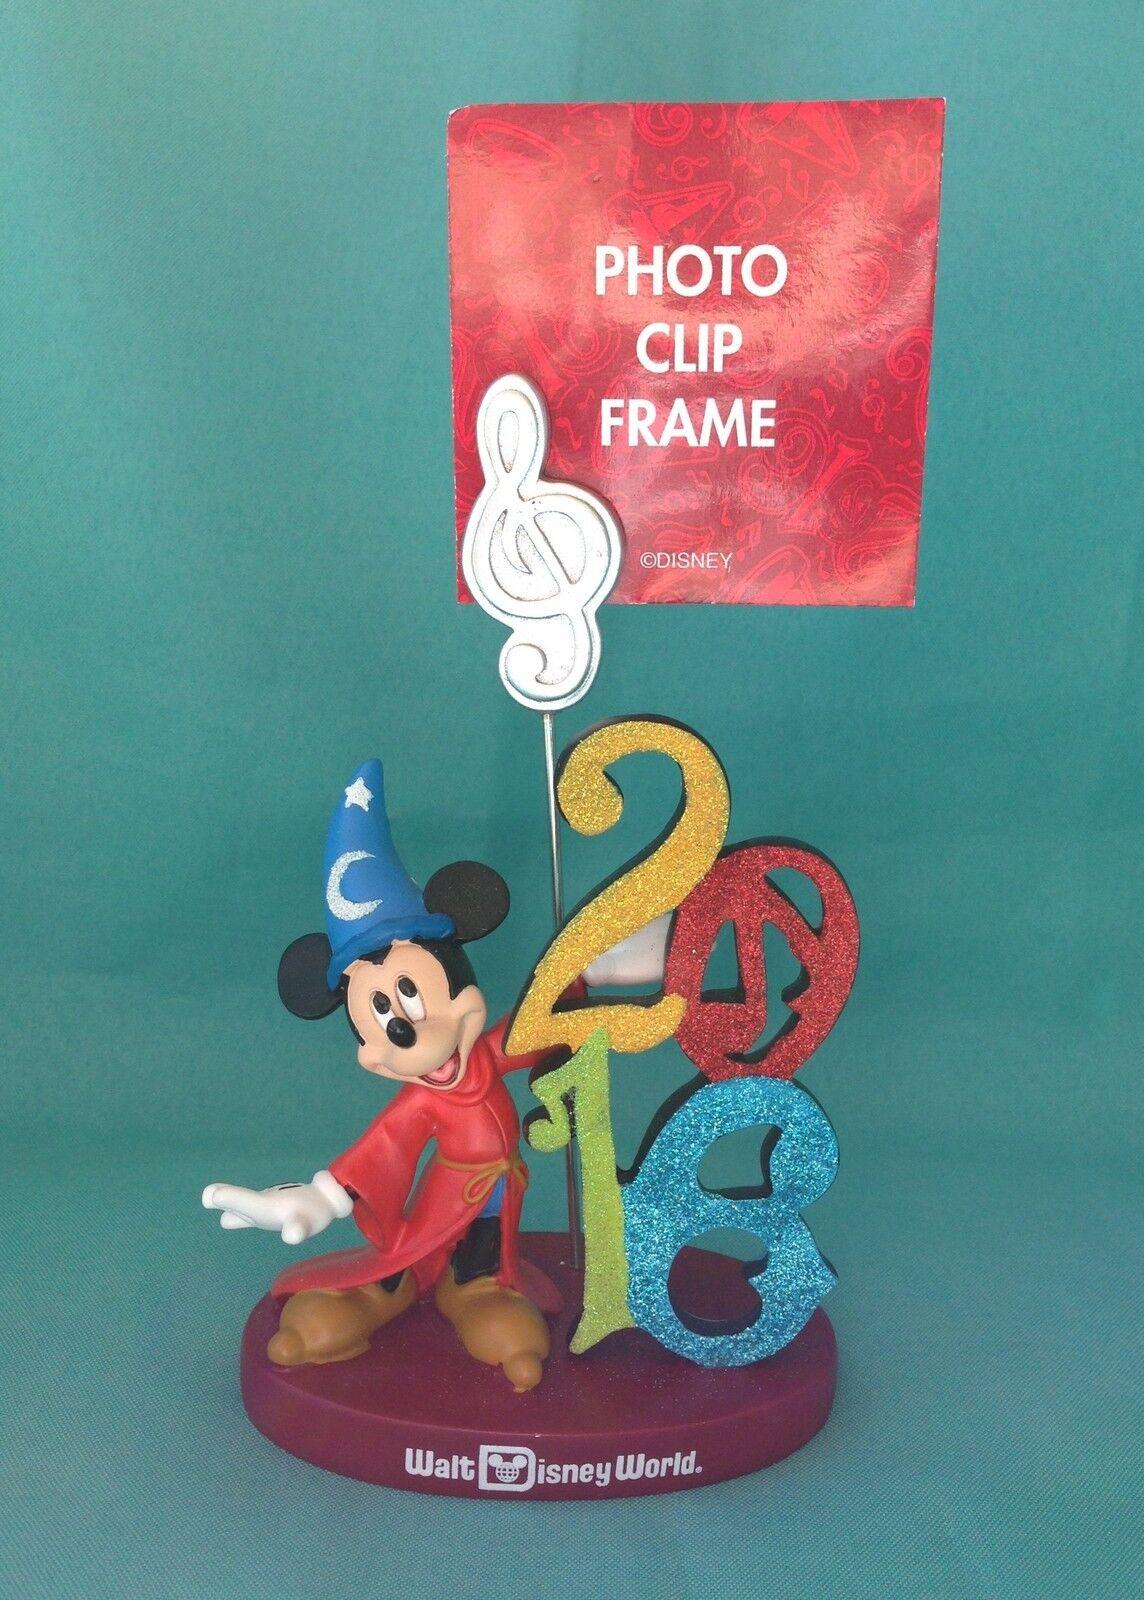 2016 Disney World Sorcerer Mickey Clip Photo Frame | eBay